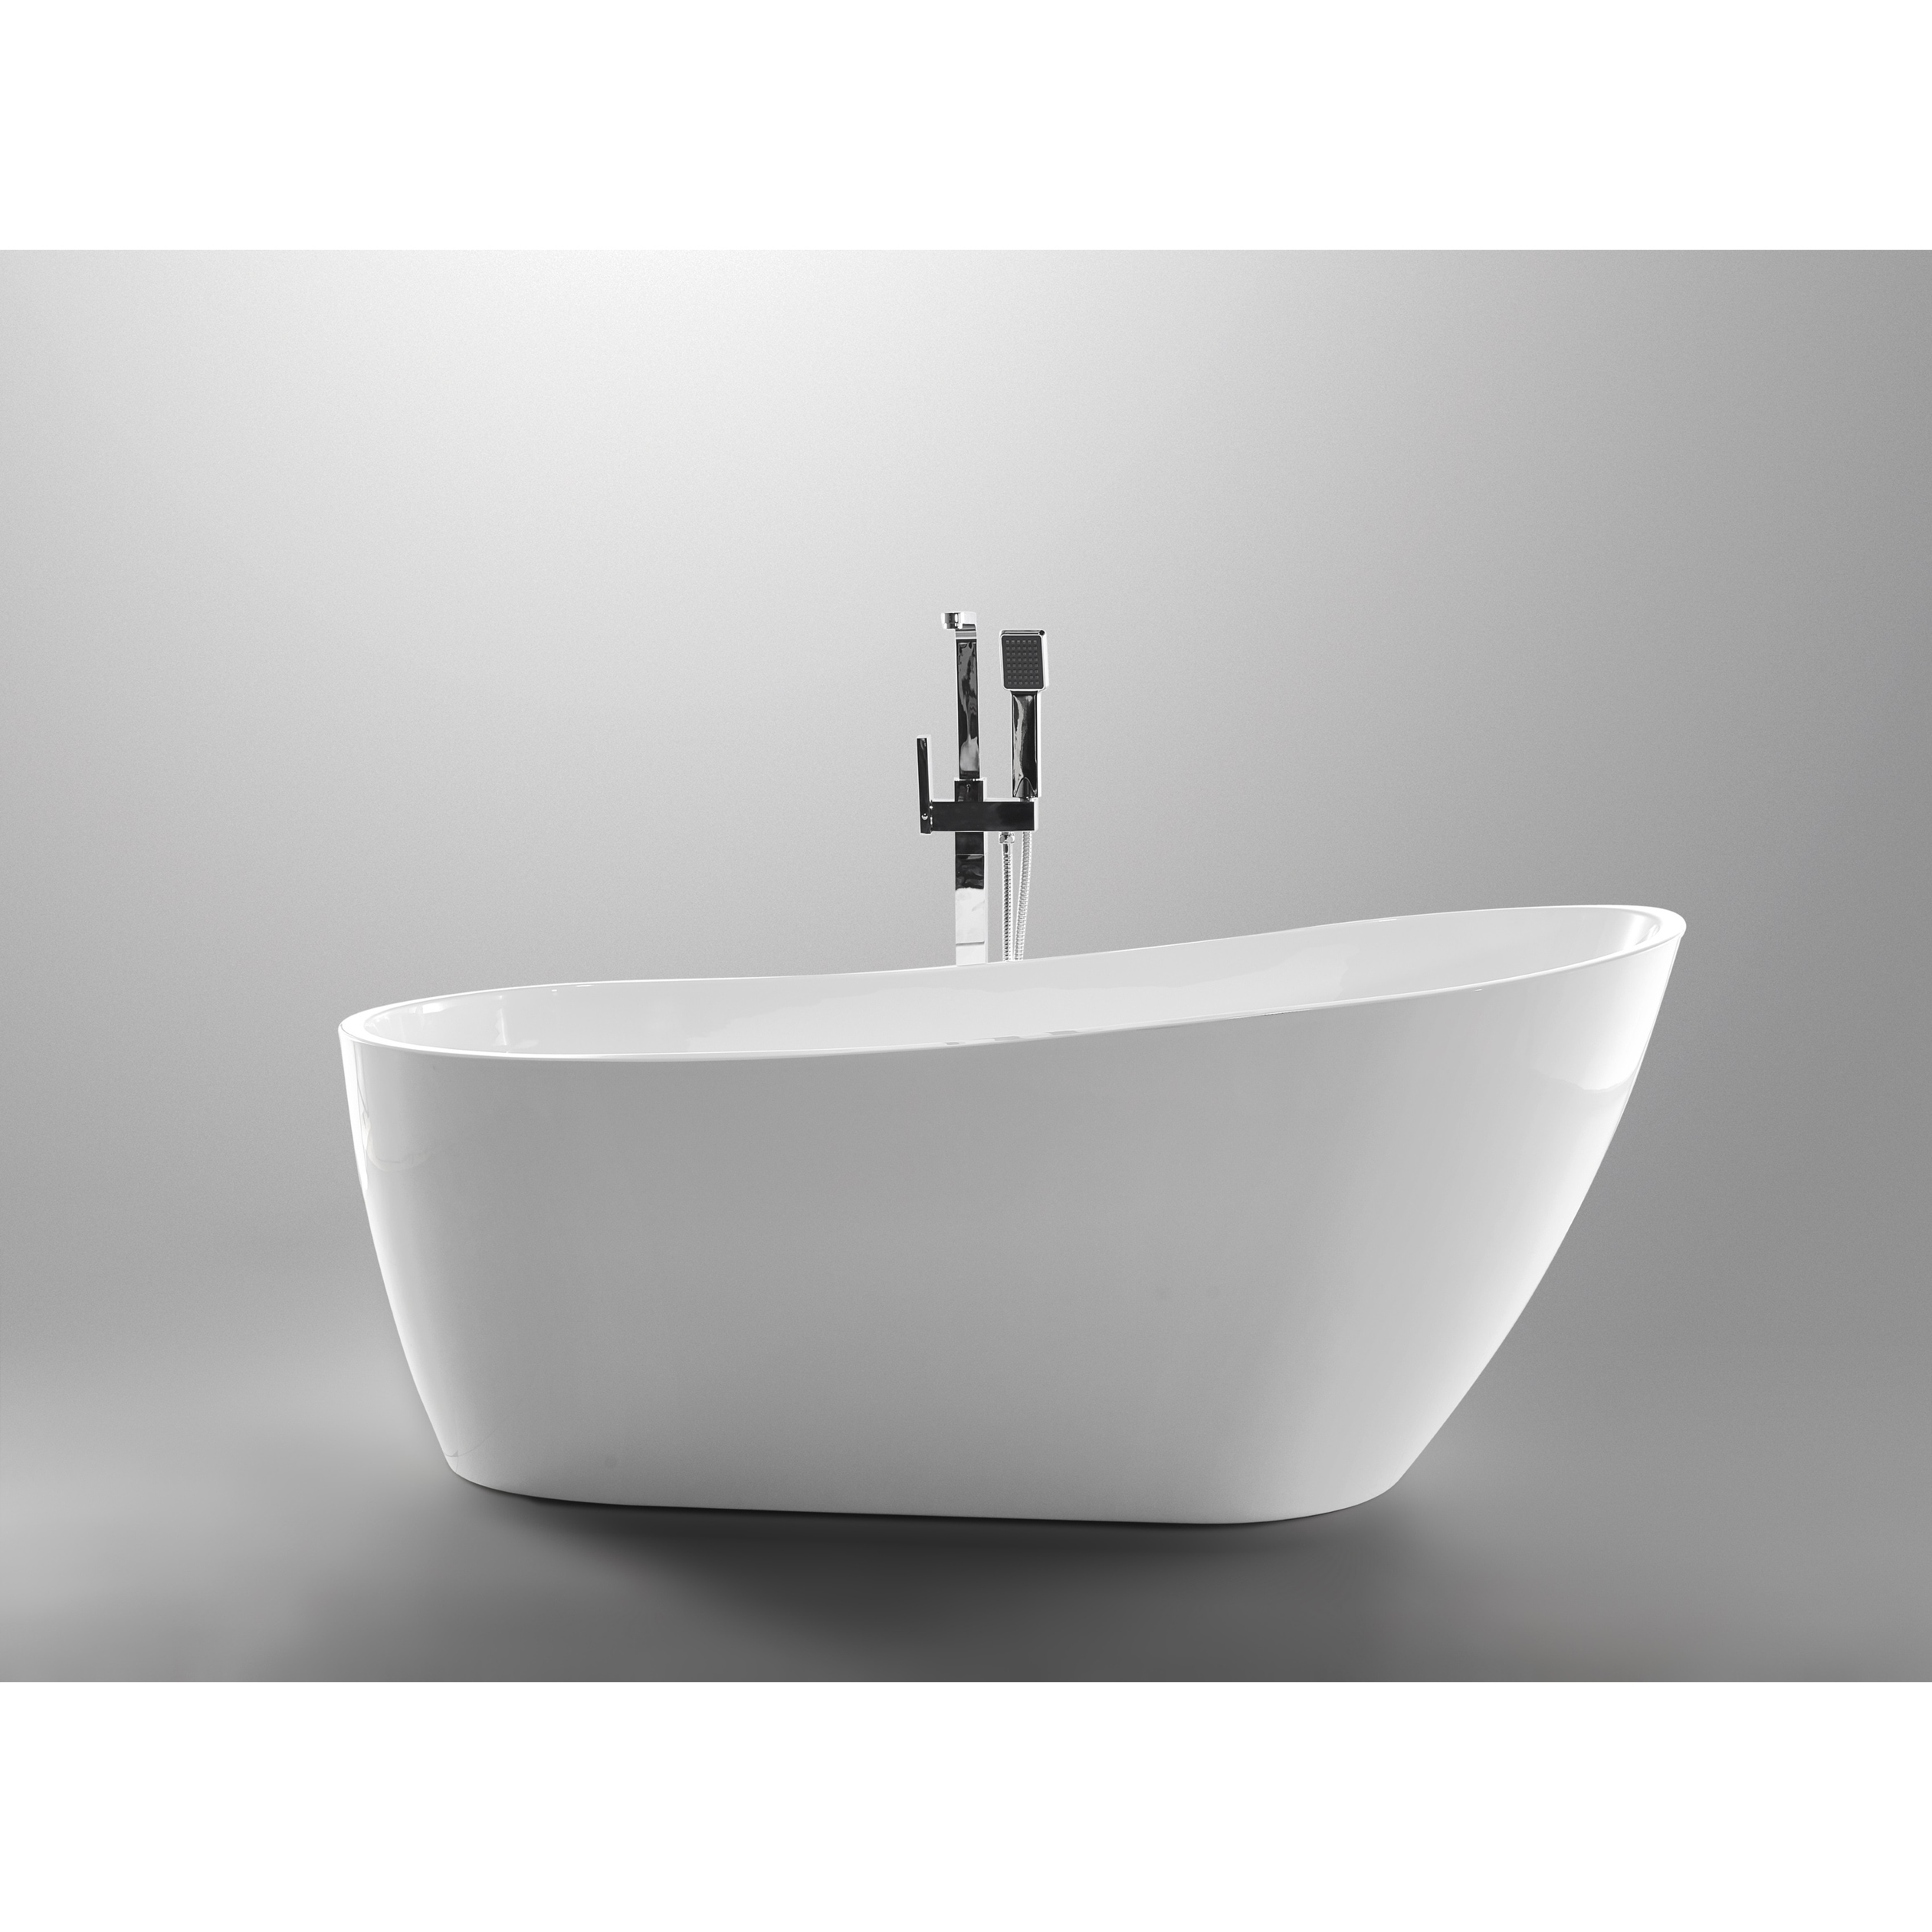 Shop Vanity Art 55 Inch Freestanding Acrylic Soaking Bathtub Free